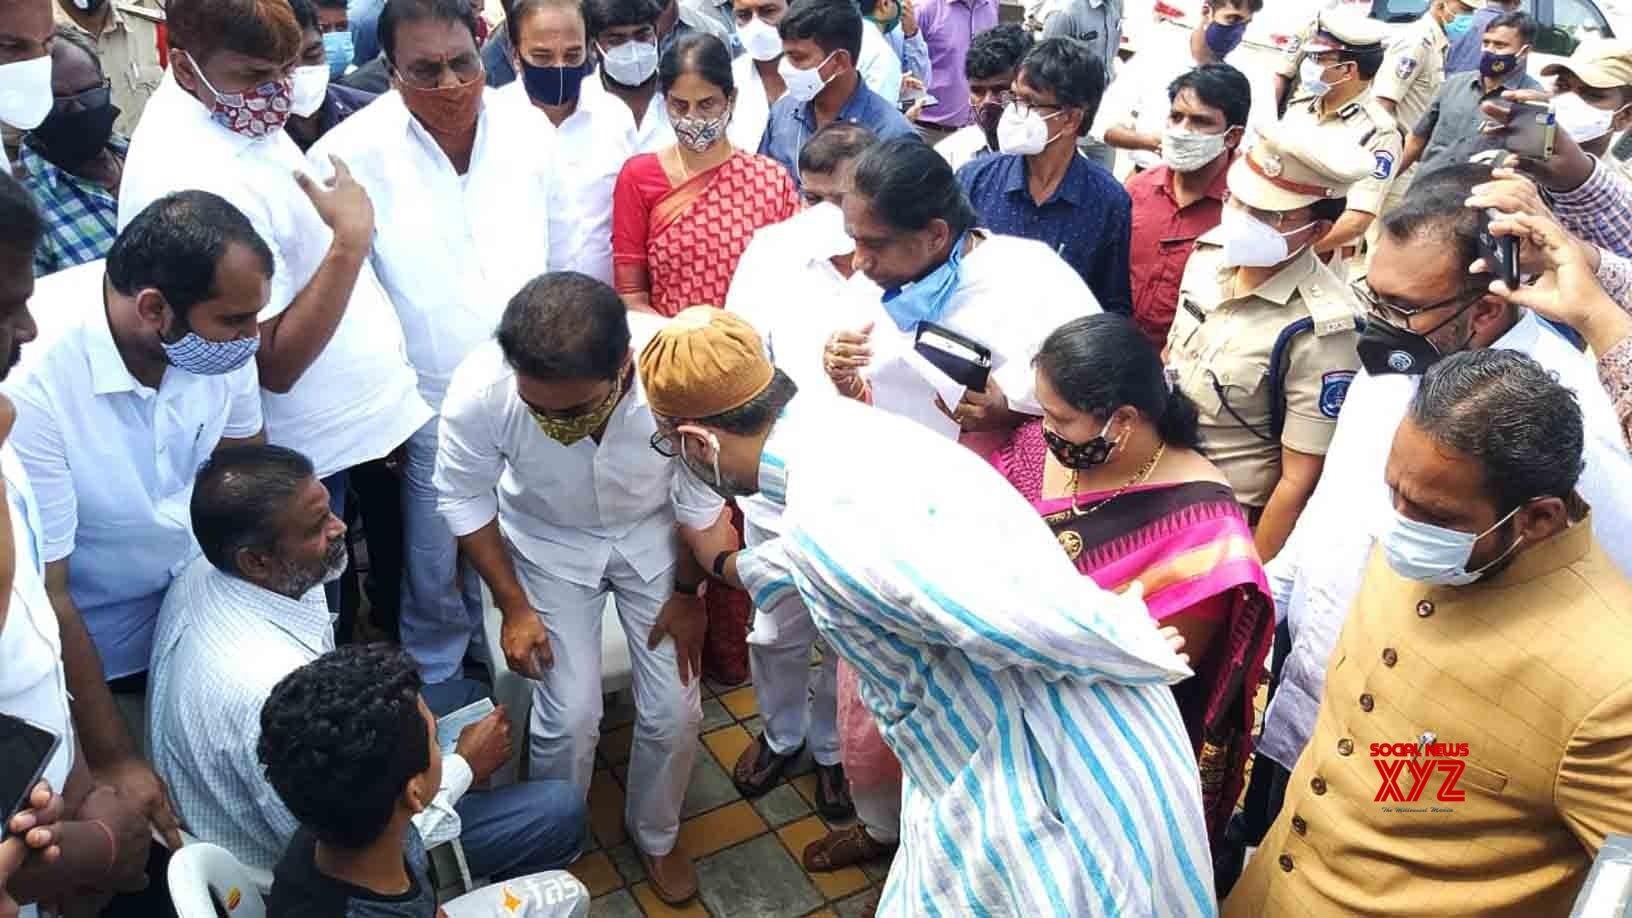 Hyderabad: KT Rama Rao, Asaduddin Owaisi visit flood - affected areas of Hyderabad #Gallery